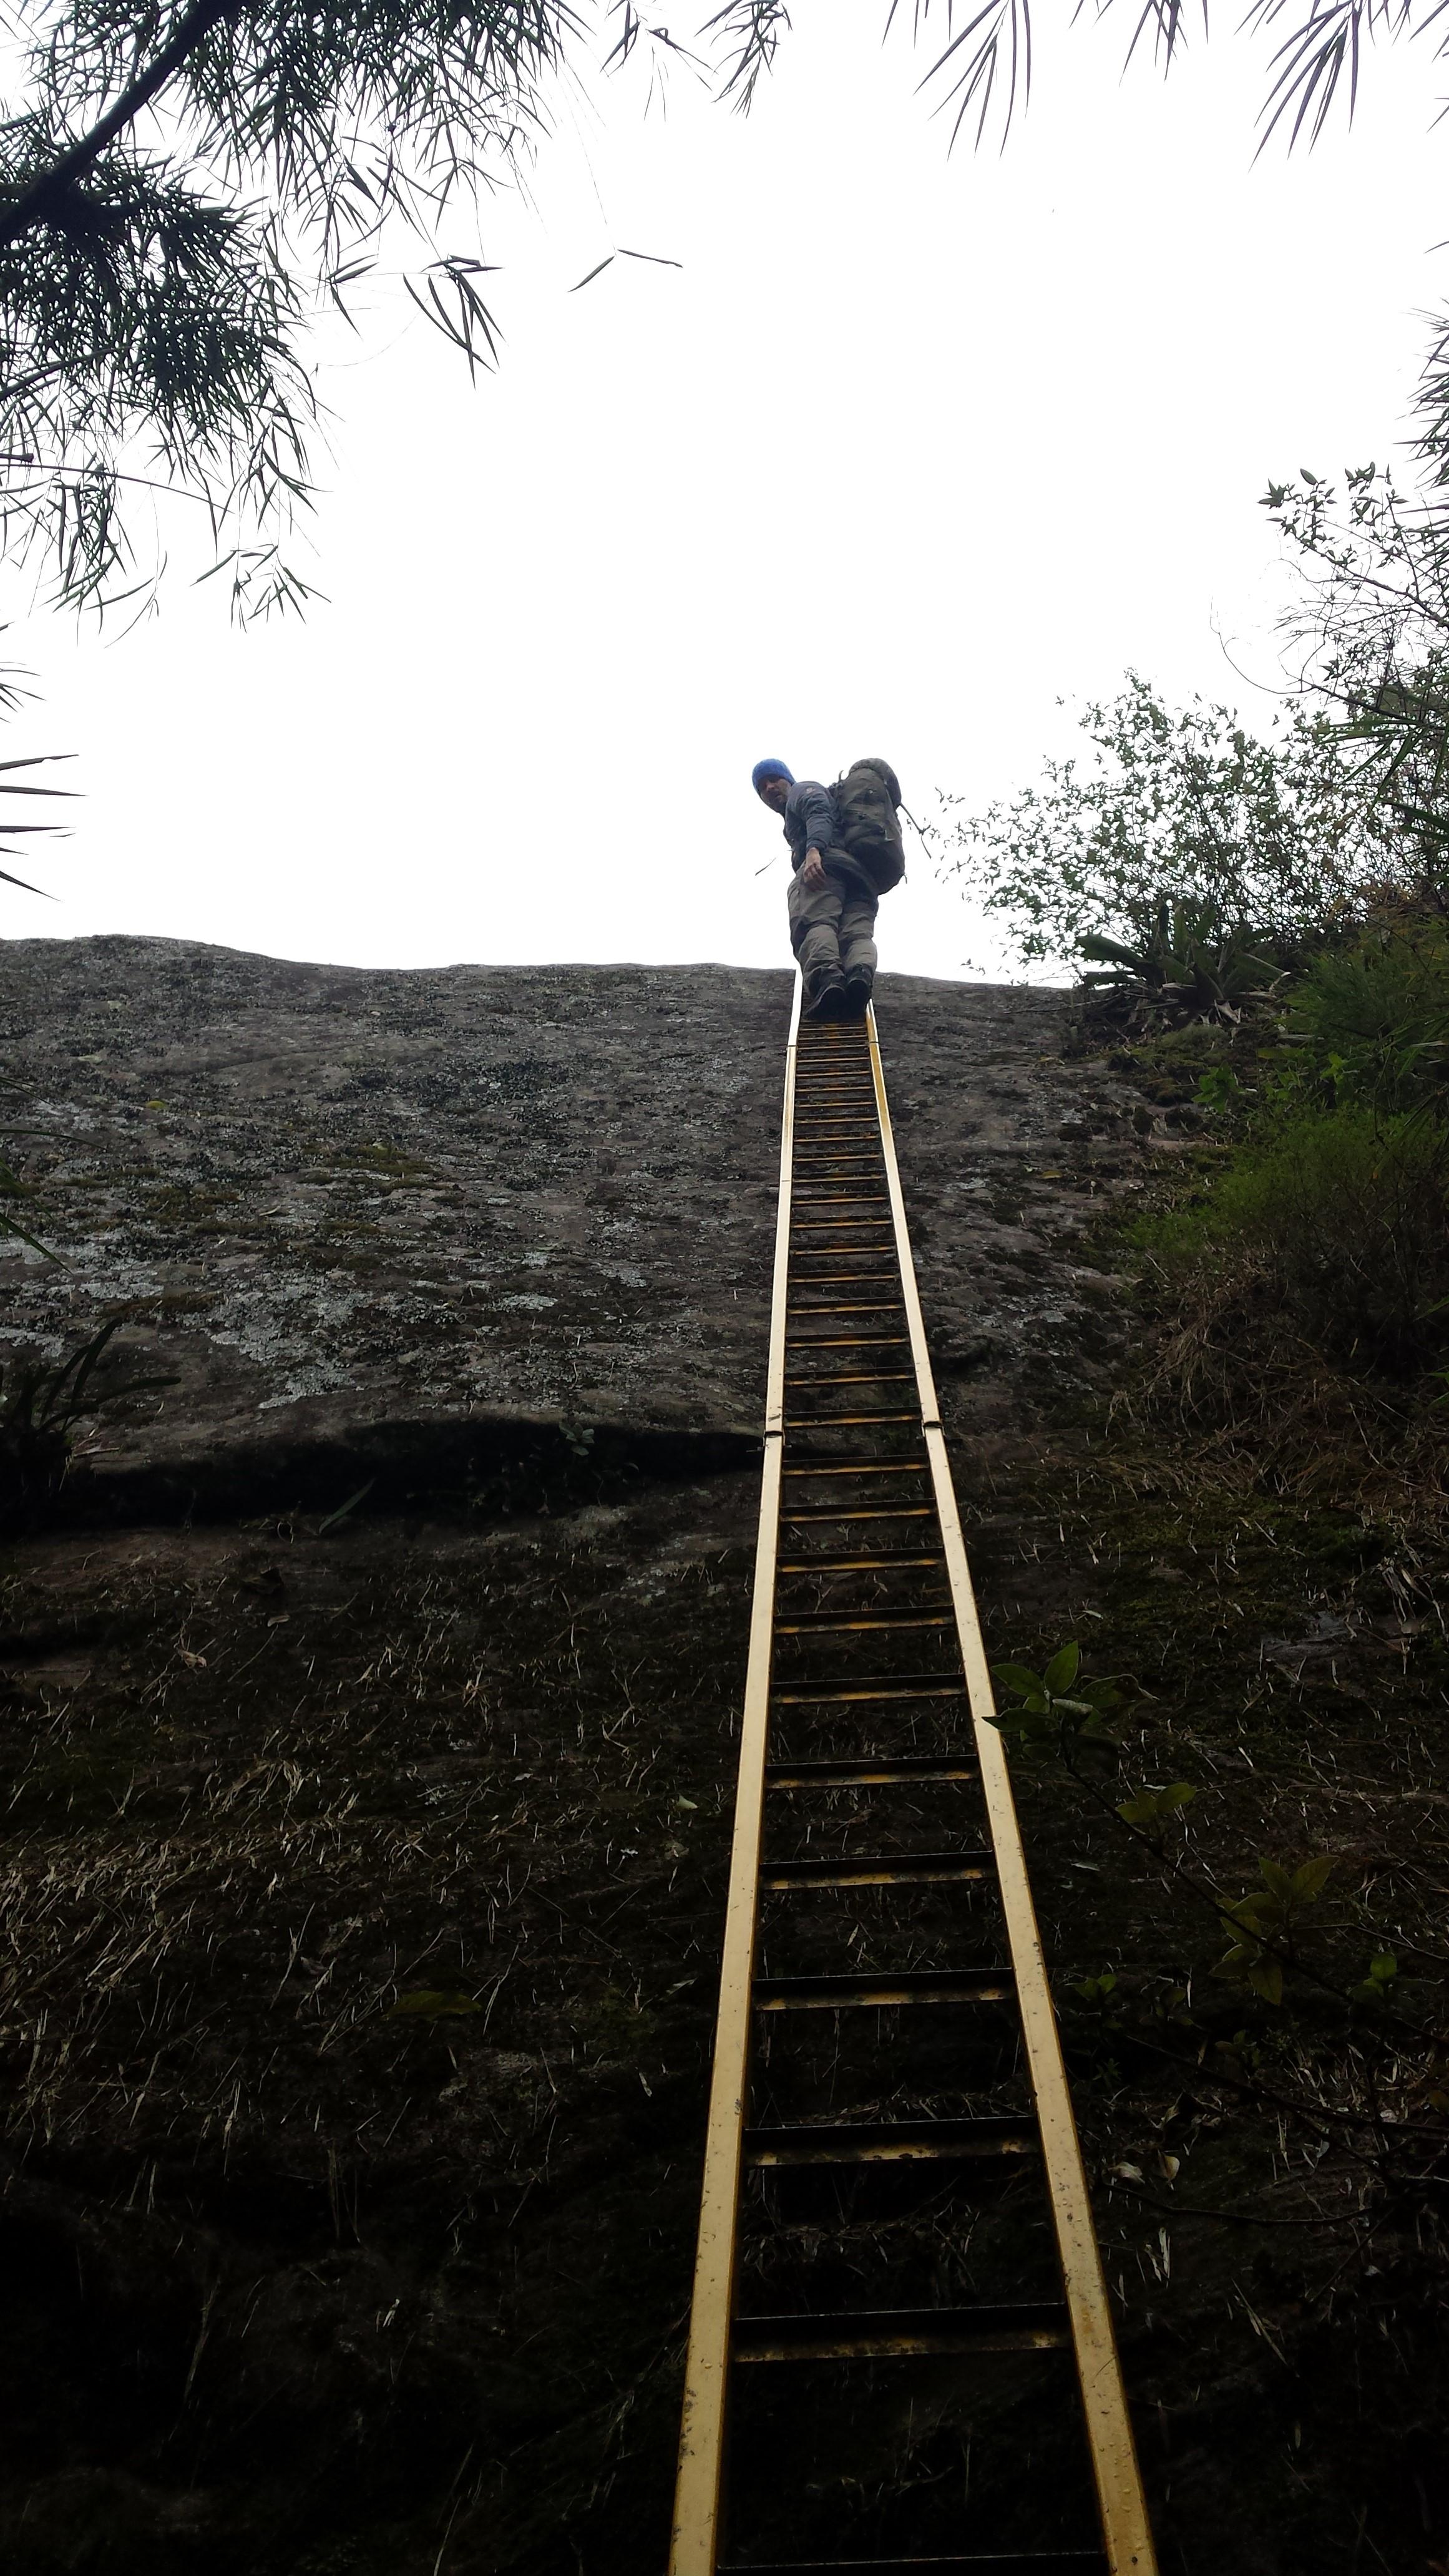 Escada de acesso ao colo